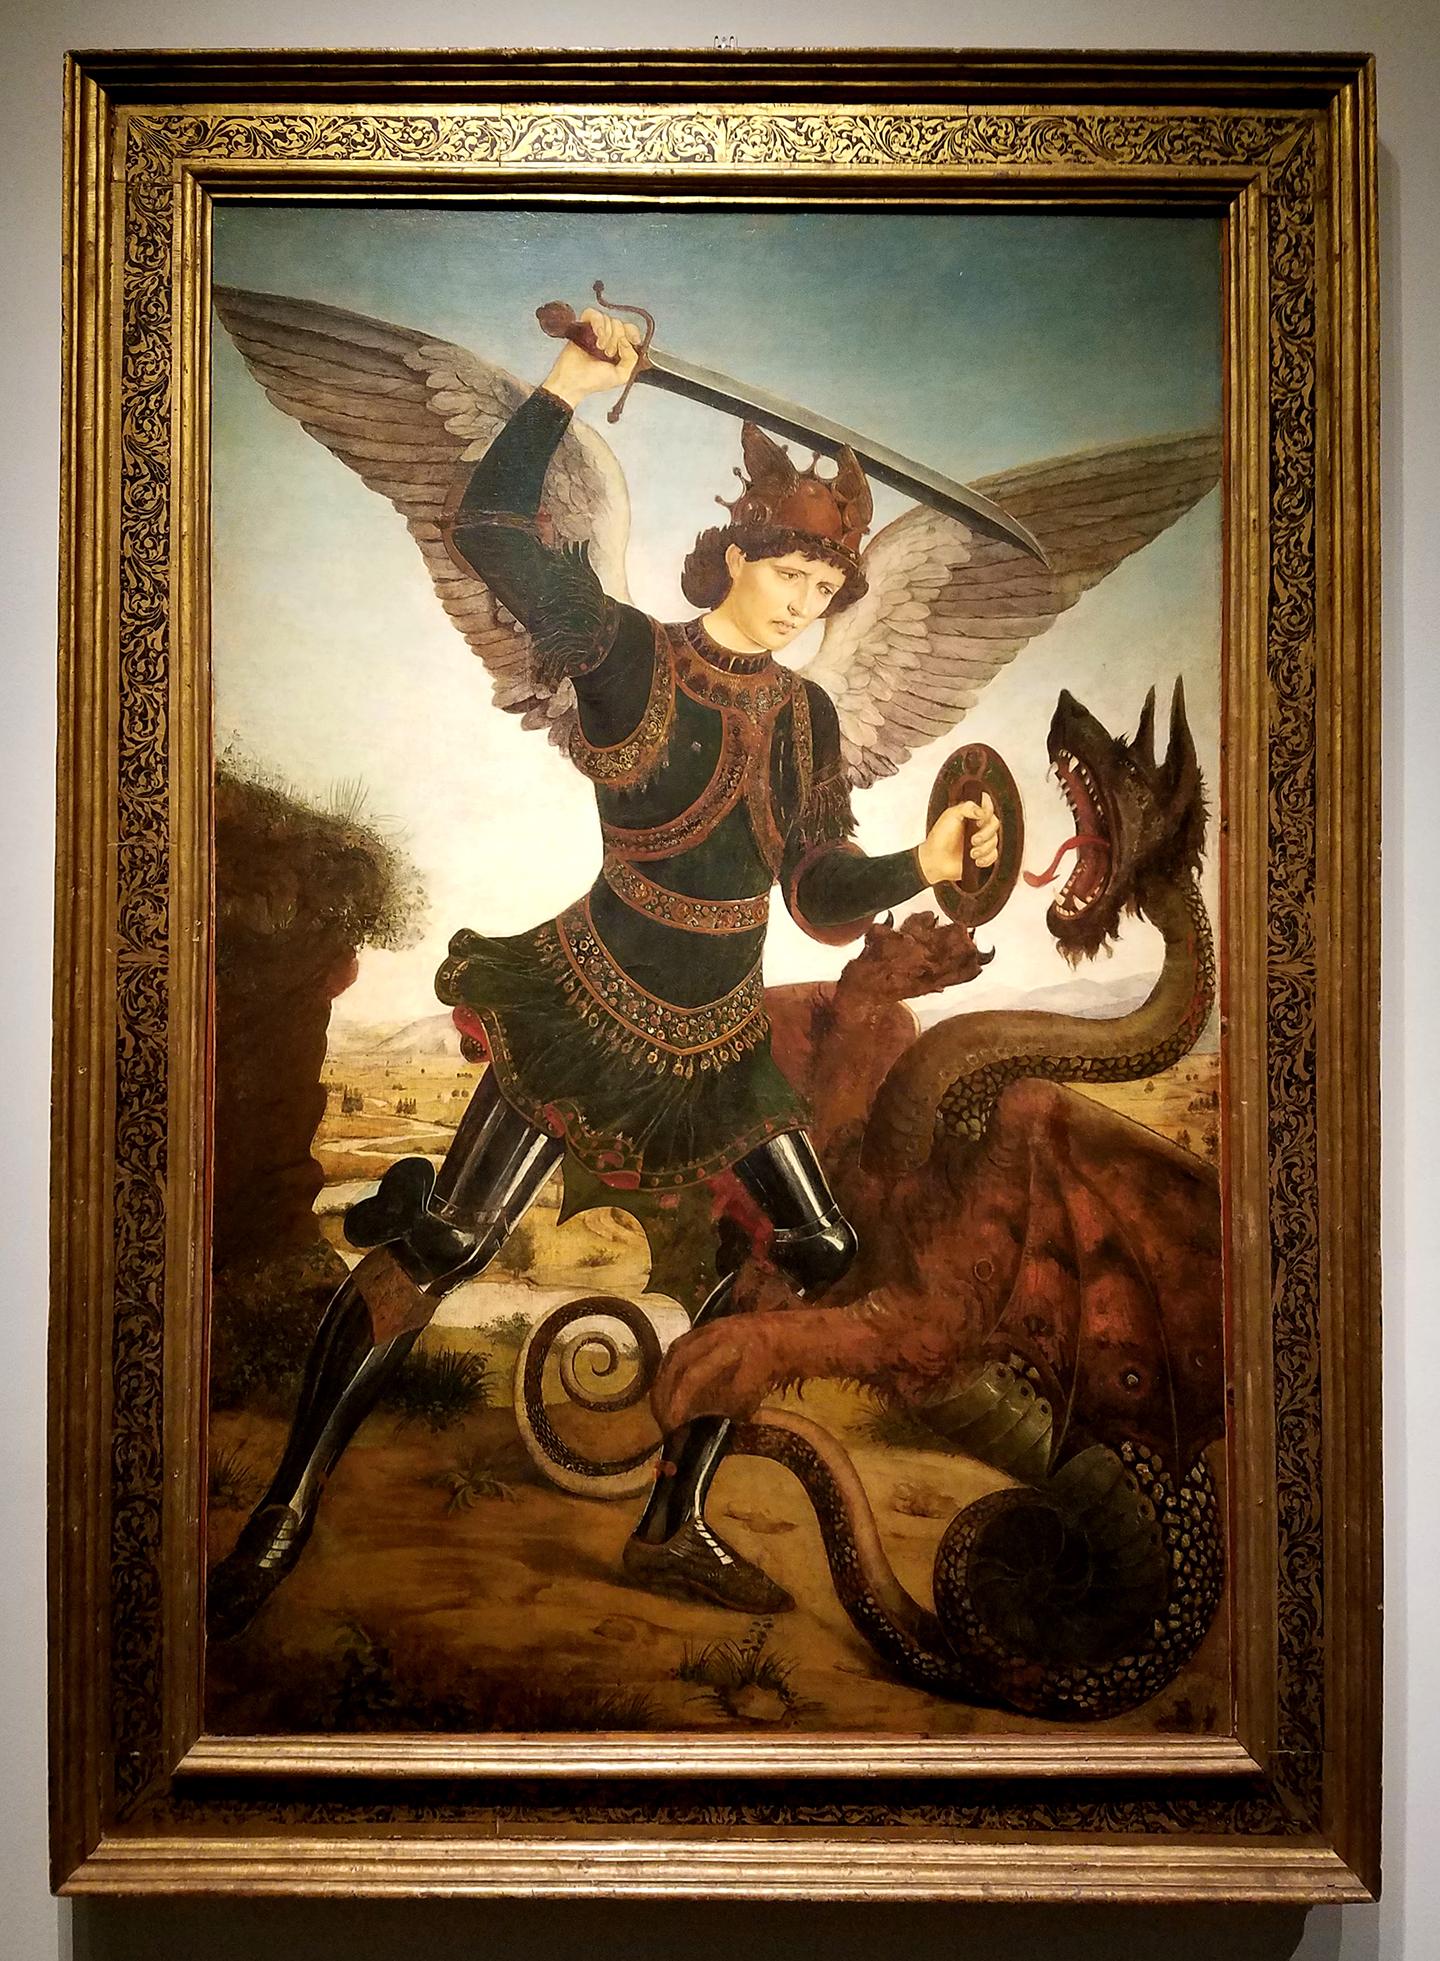 Antonio del Pollaiuolo - St. Michael the Archangel Killing the Dragon, 1465-70